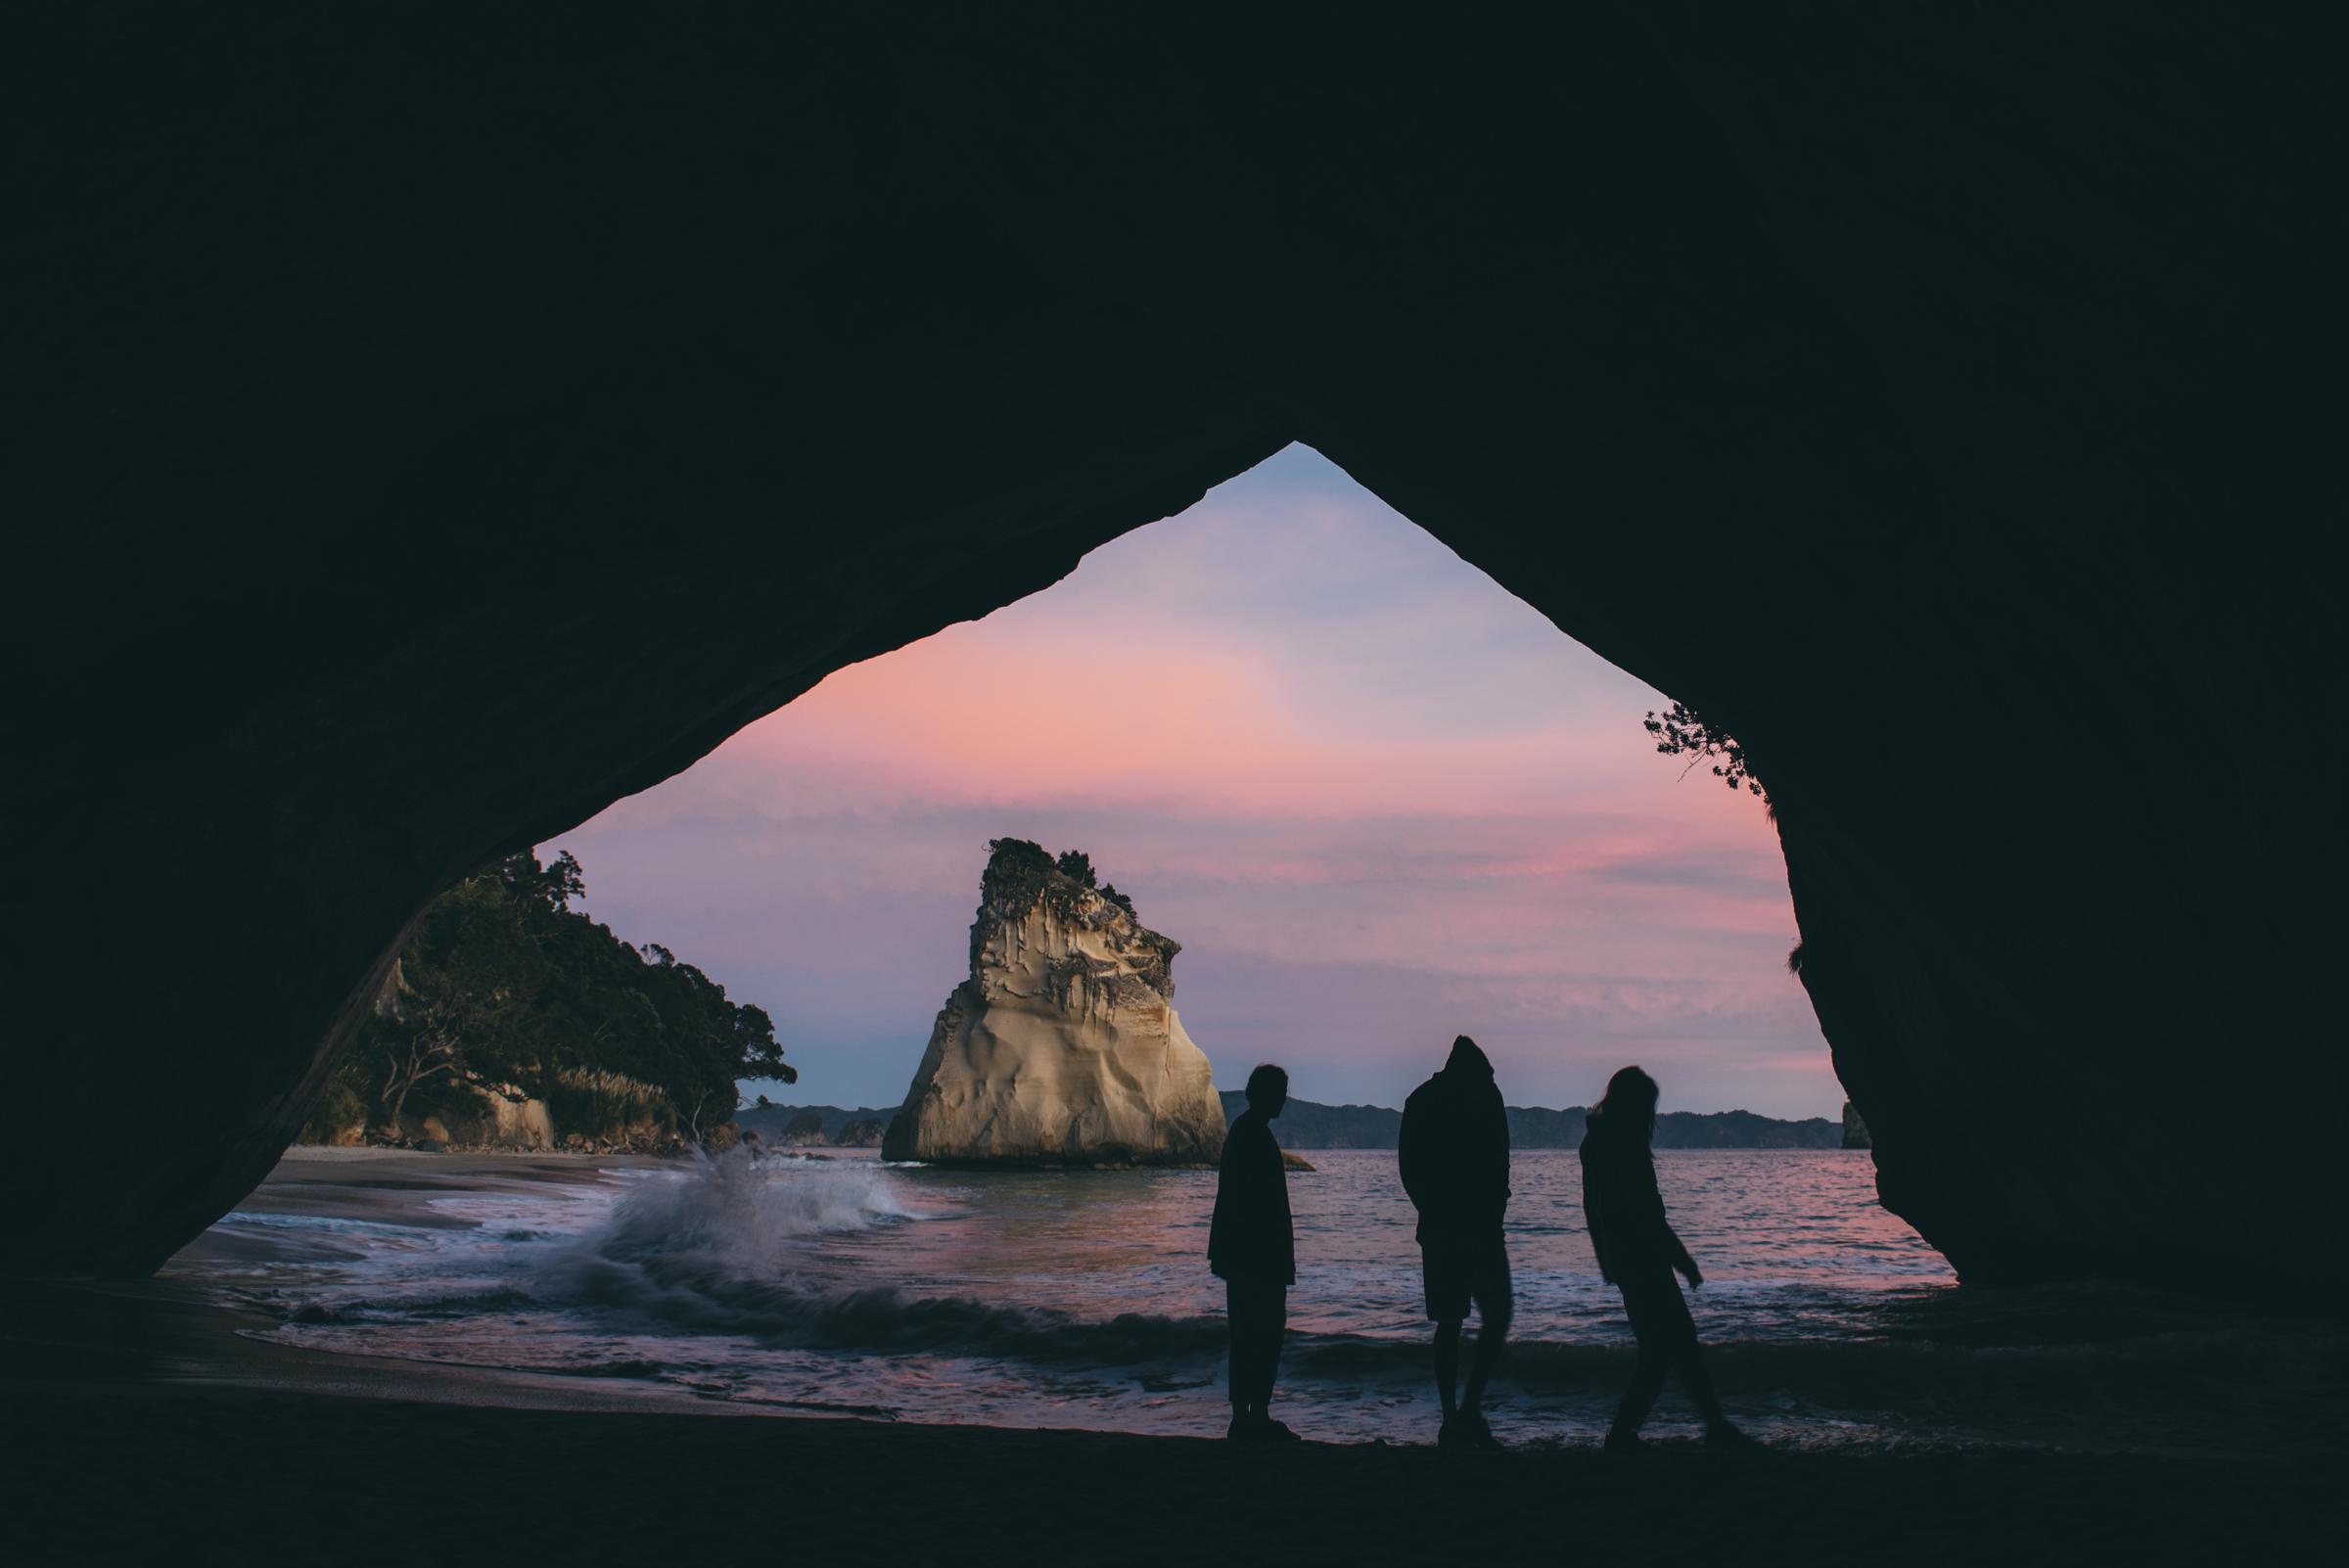 New Zealand Road Trip Lola Photography WEB_006.jpg